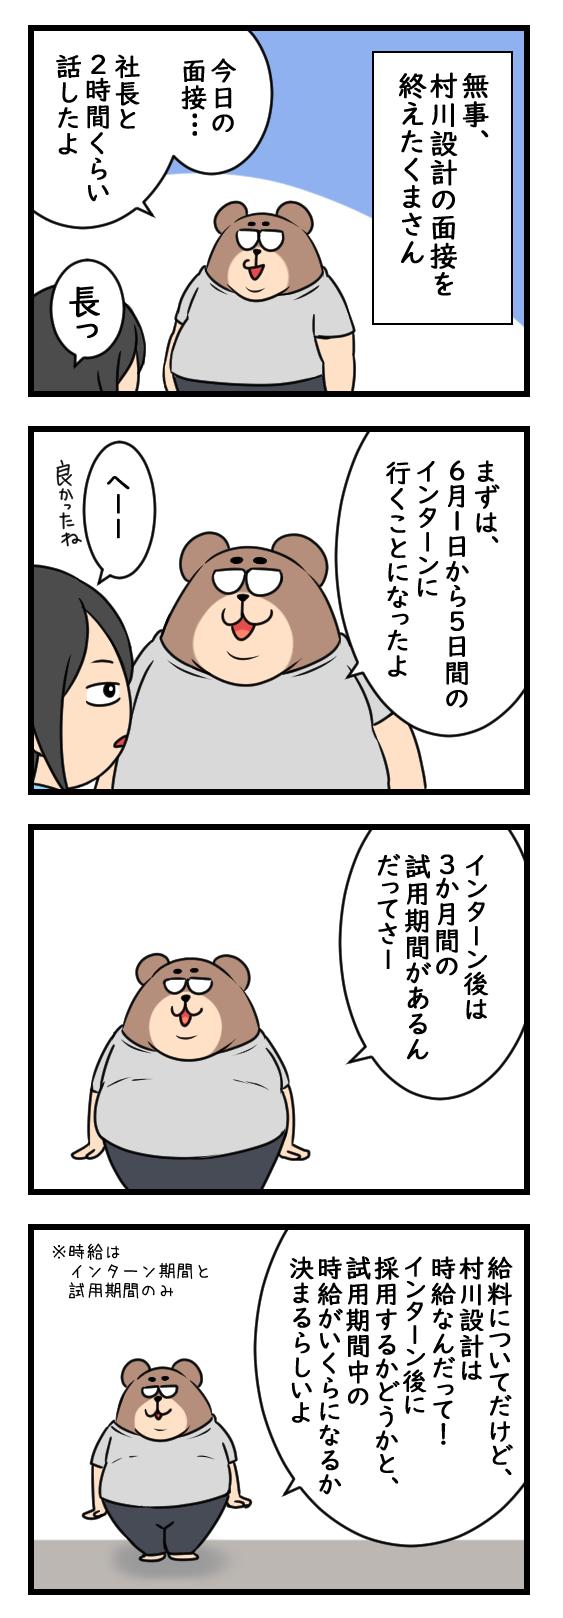 009_1